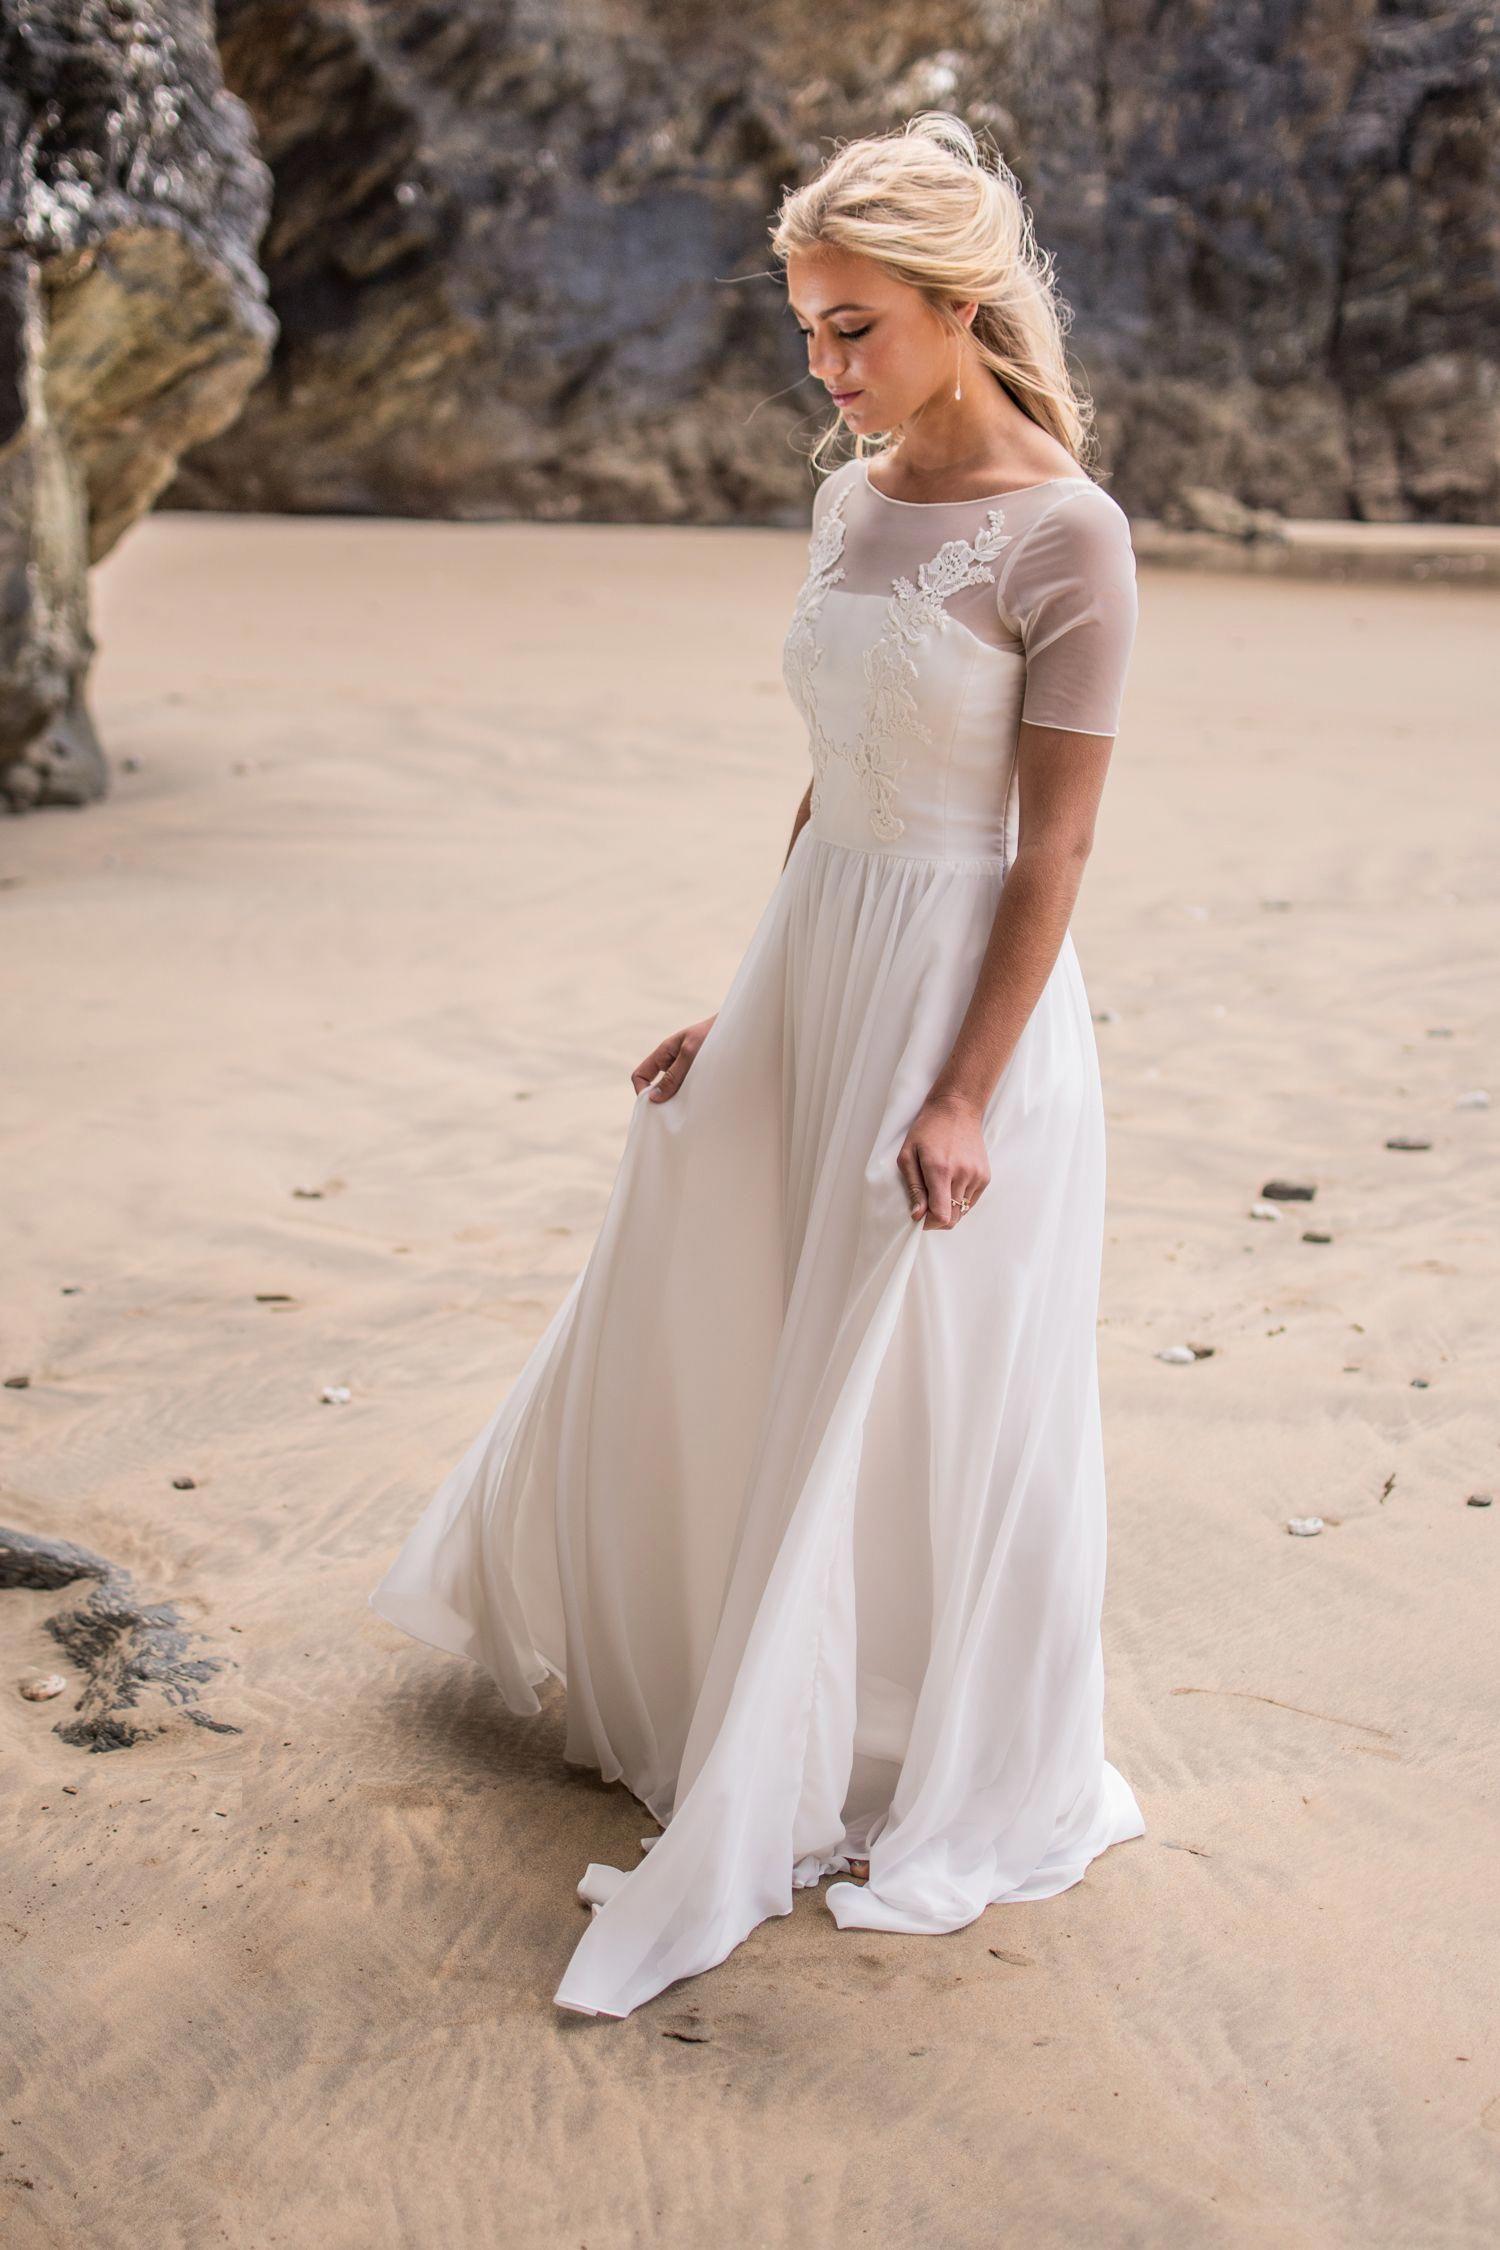 Pin on simple wedding dress